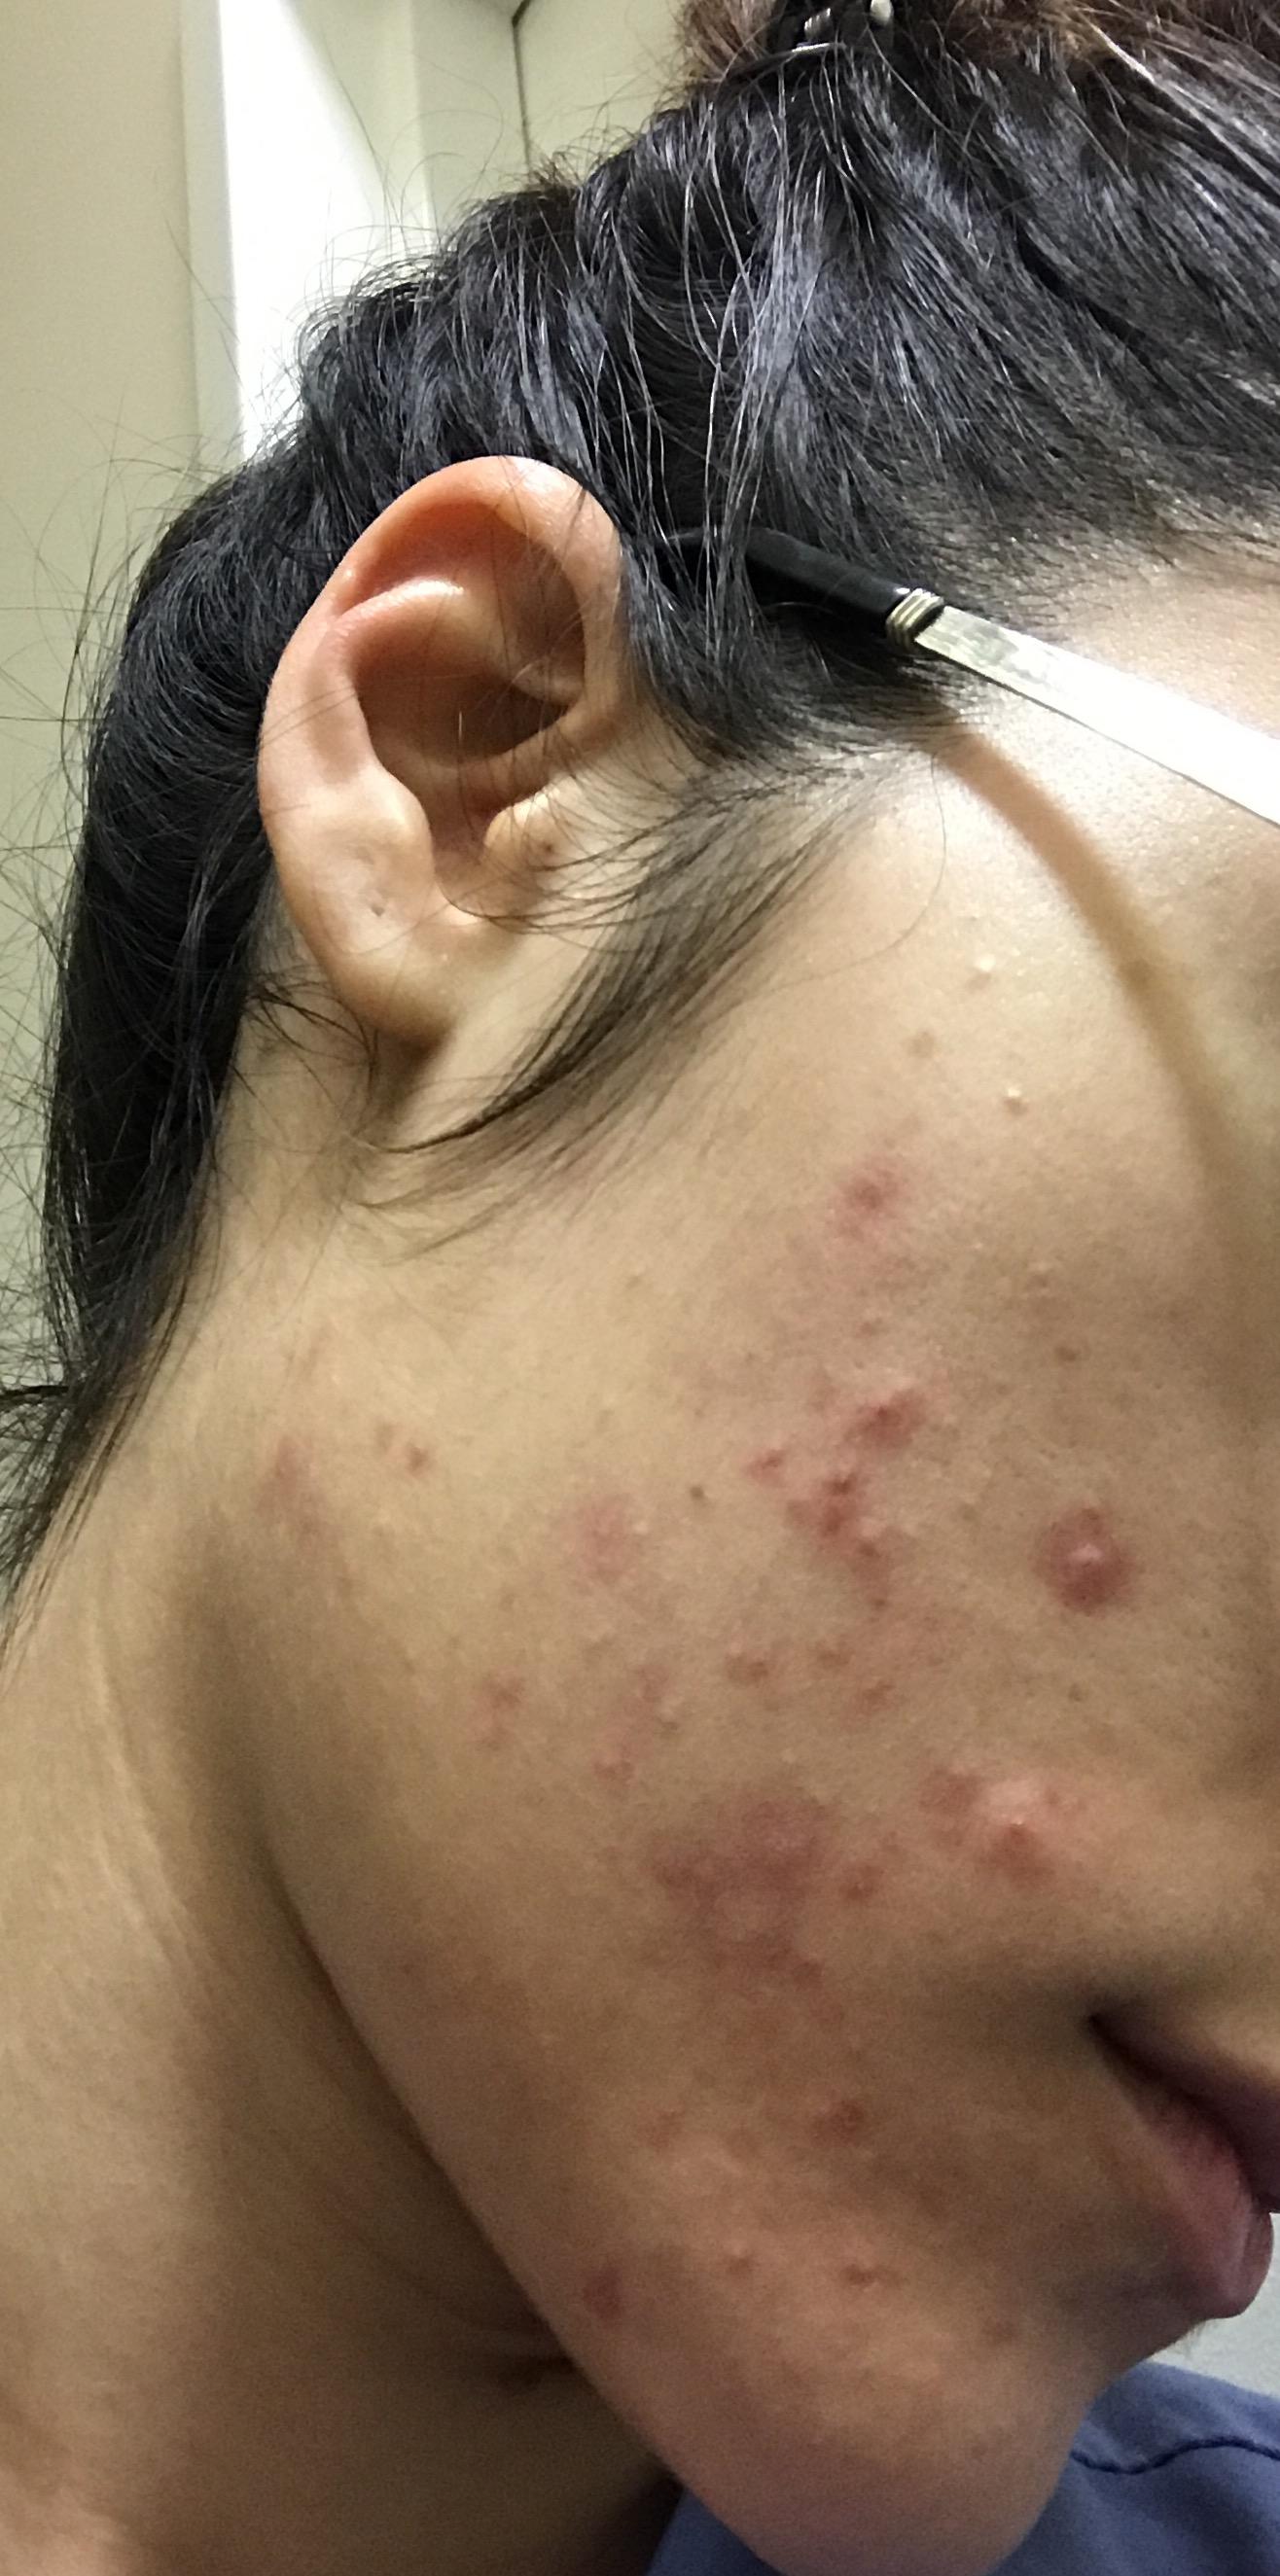 Retin A ruined my skin in 4 weeks - Prescription acne